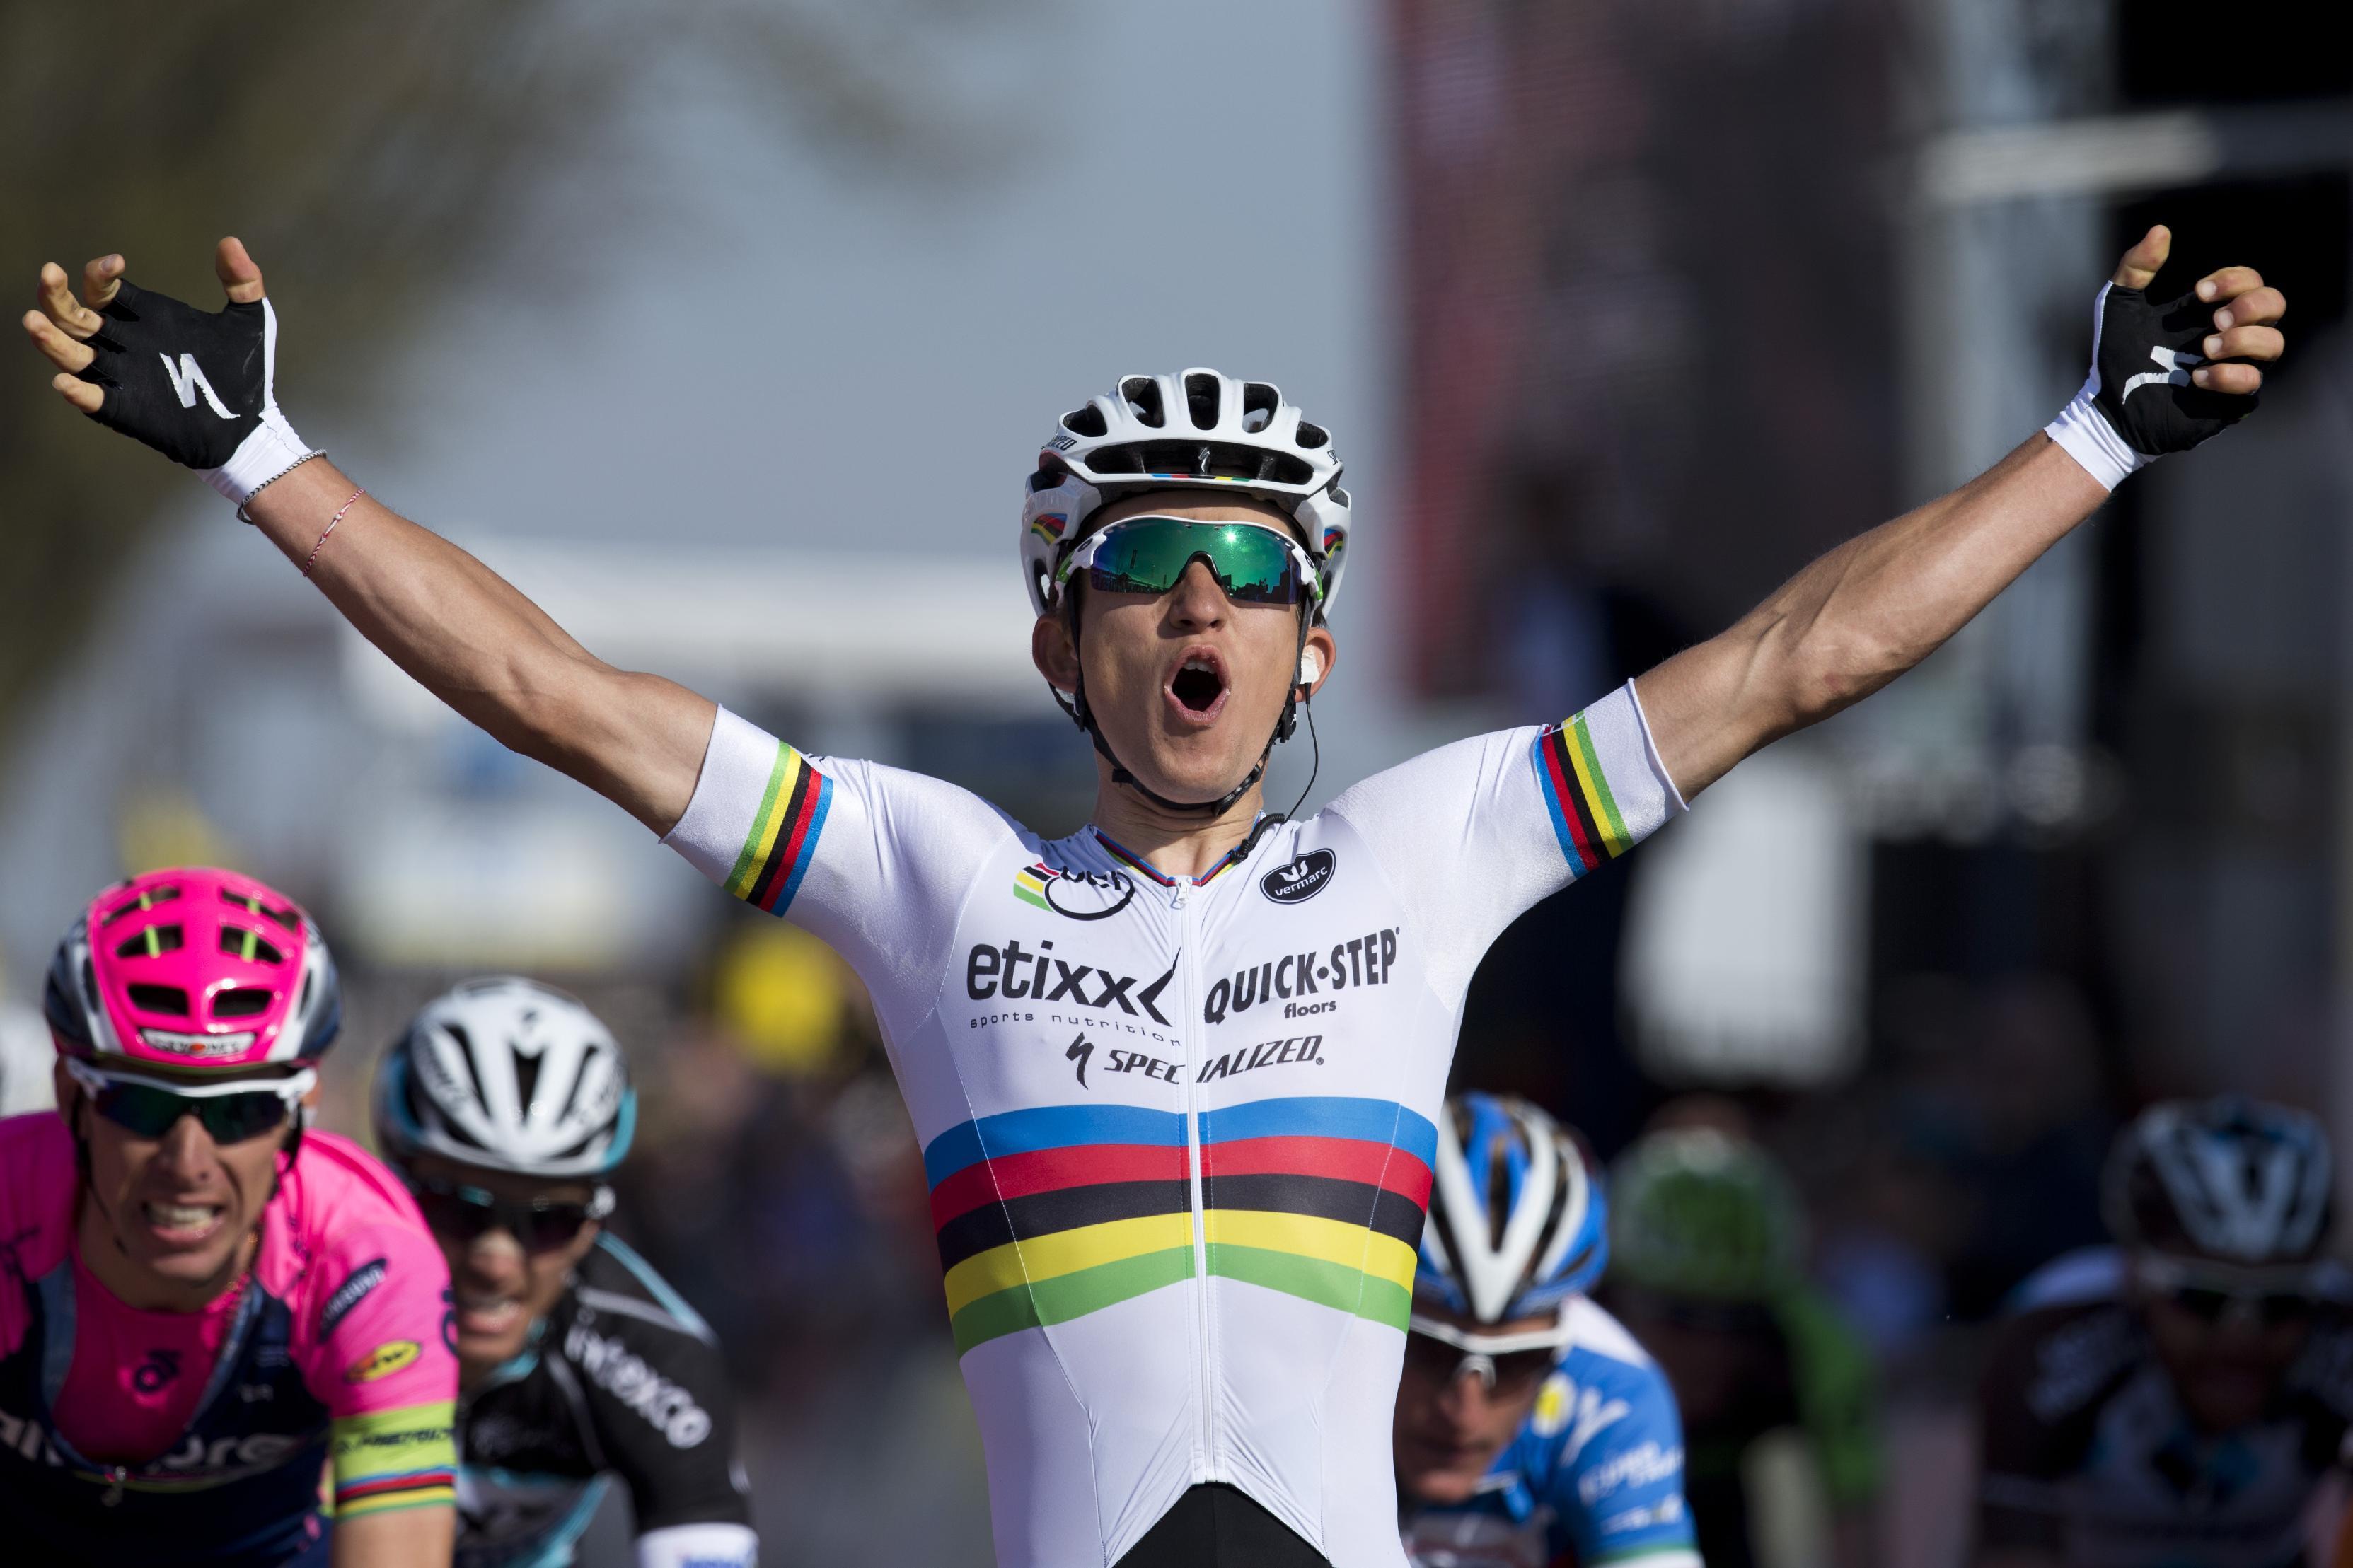 World champion Michal Kwiatkowski wins Amstel Gold Race